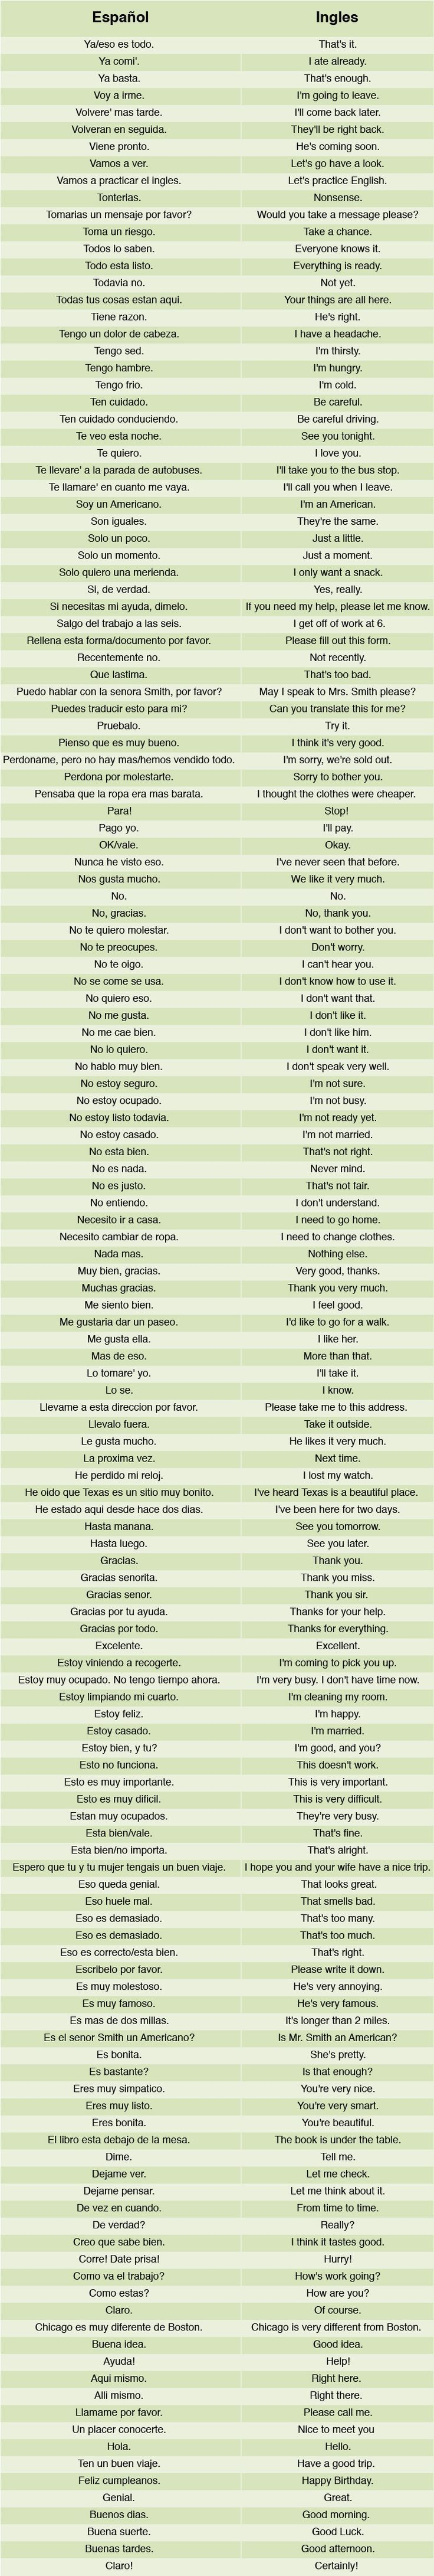 Te Dejo Cosas útiles Para Que Mejores Tu Inglés How To Speak Spanish Learning Spanish Spanish English